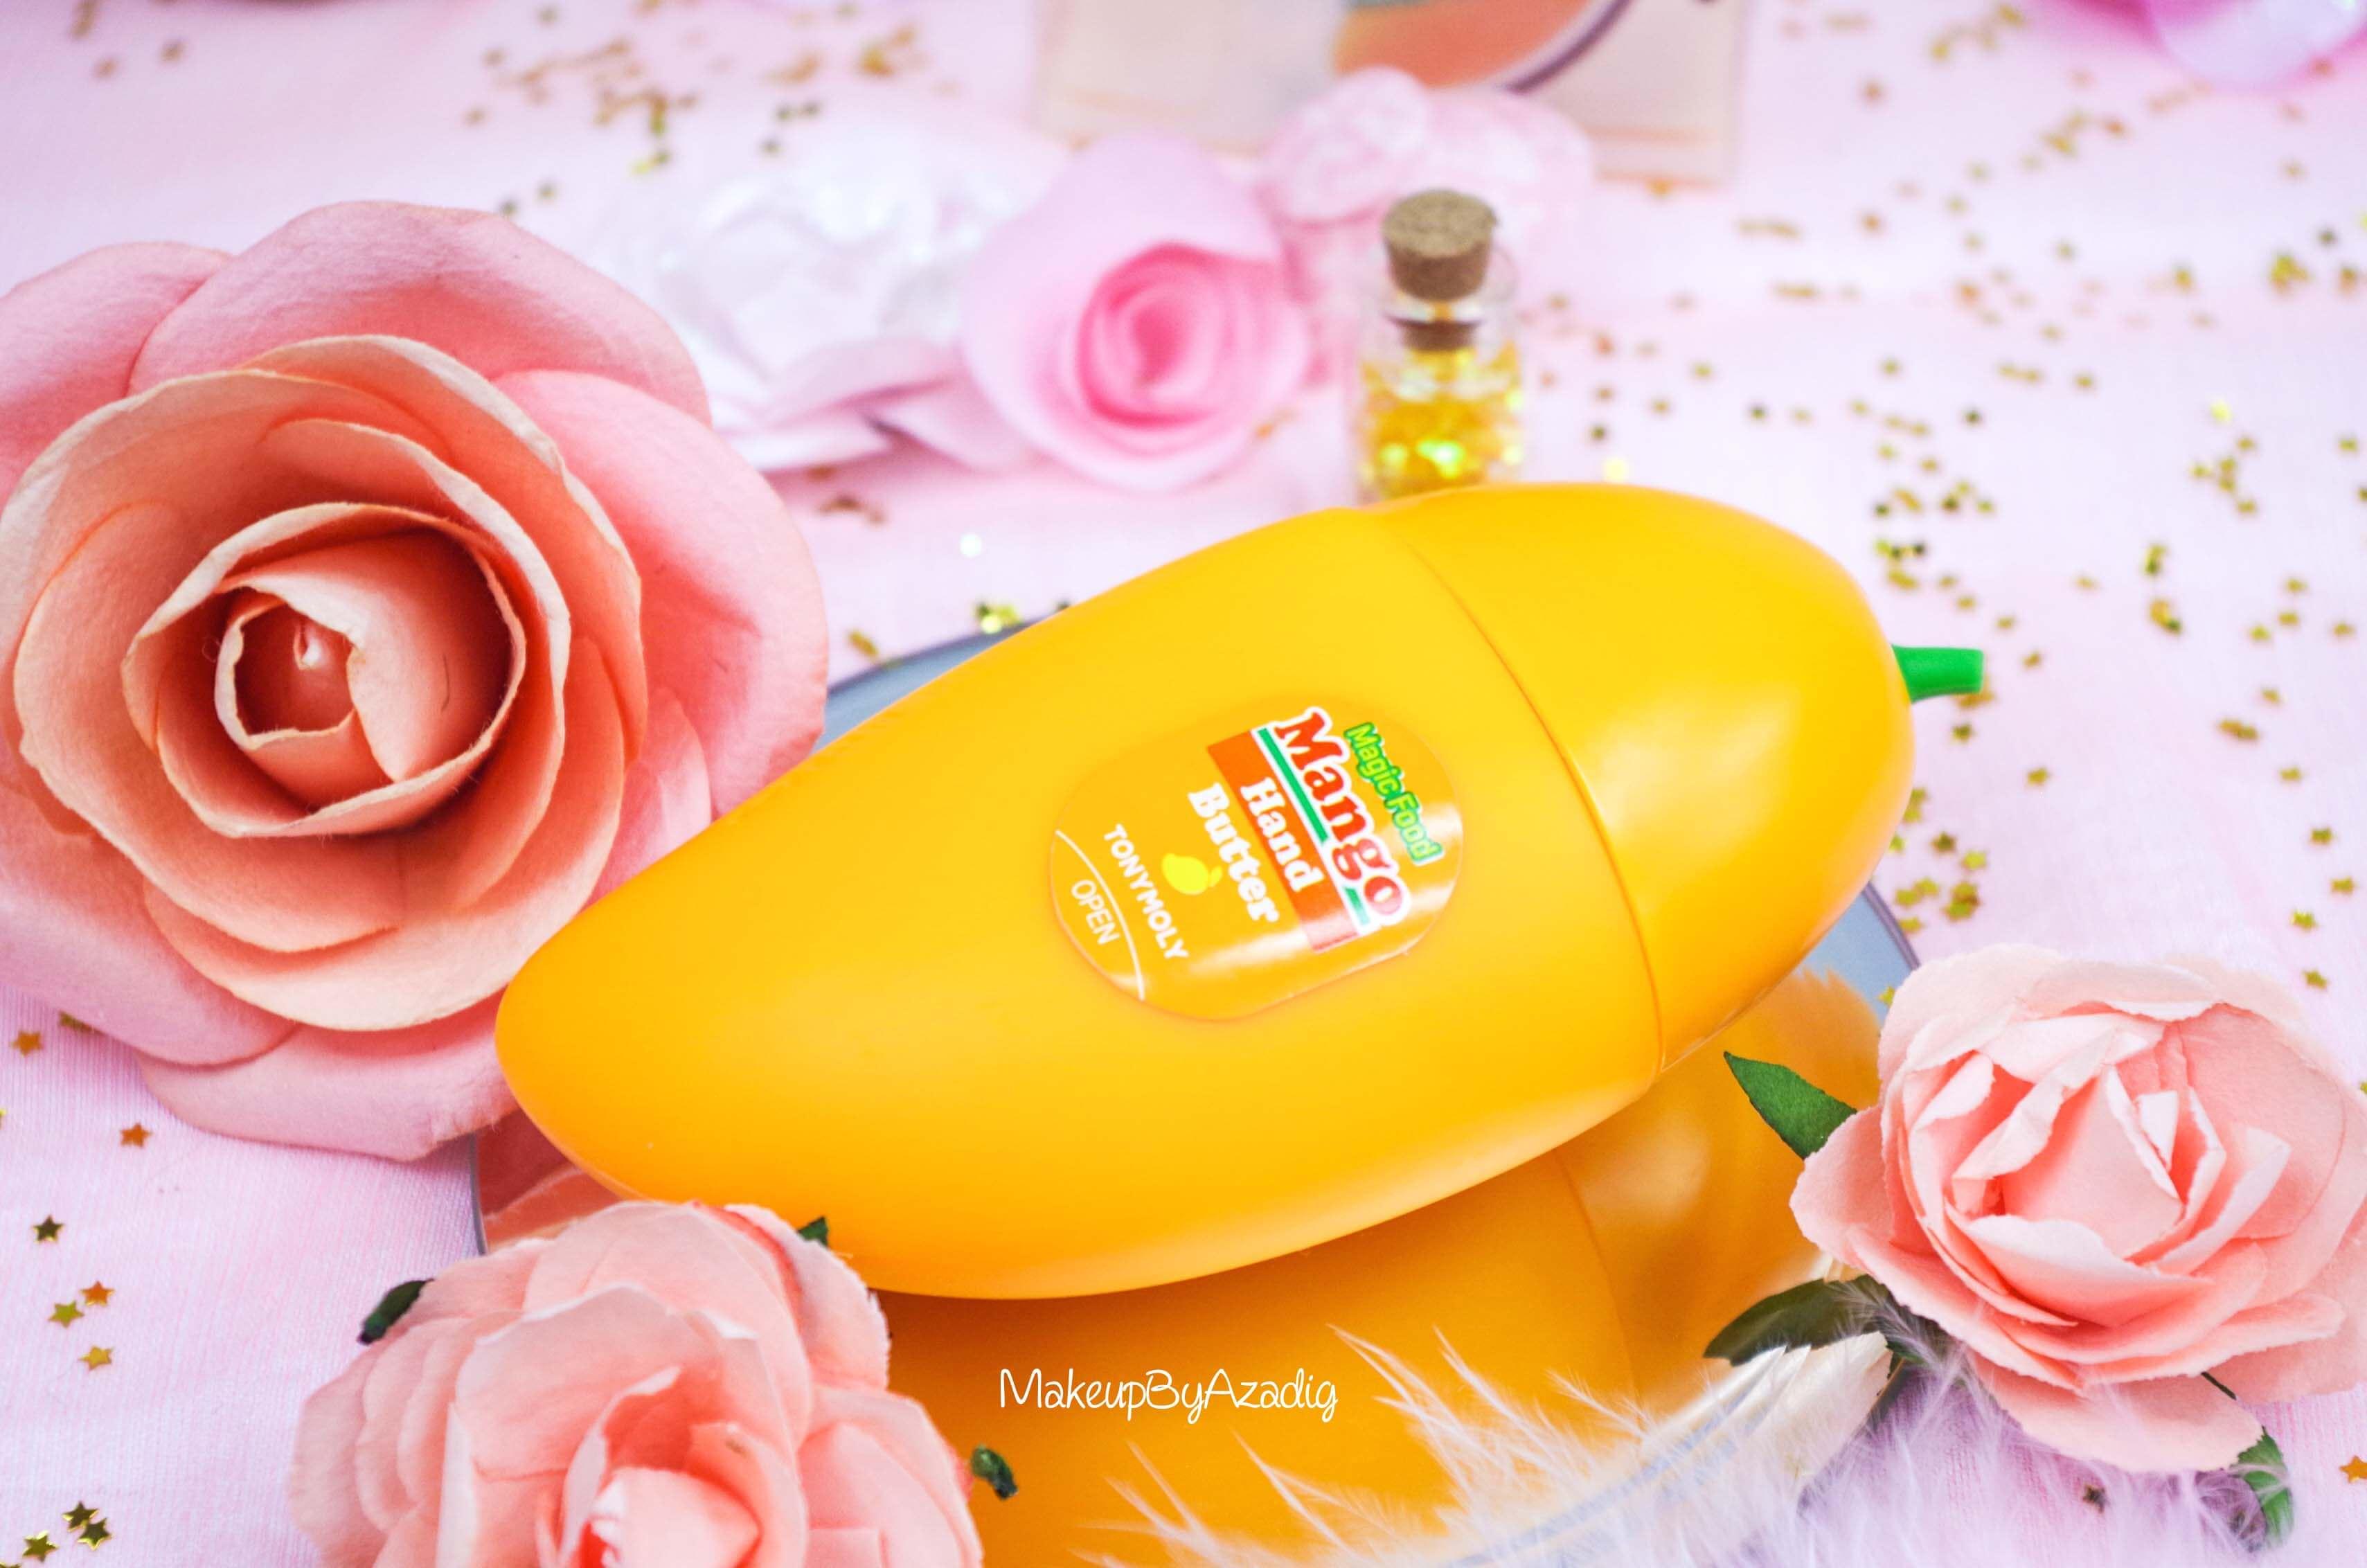 creme-mains-mango-hand-butter-tonymoly-sephora-france-cocooning-revue-avis-prix-makeupbyazadig-influencer-fun